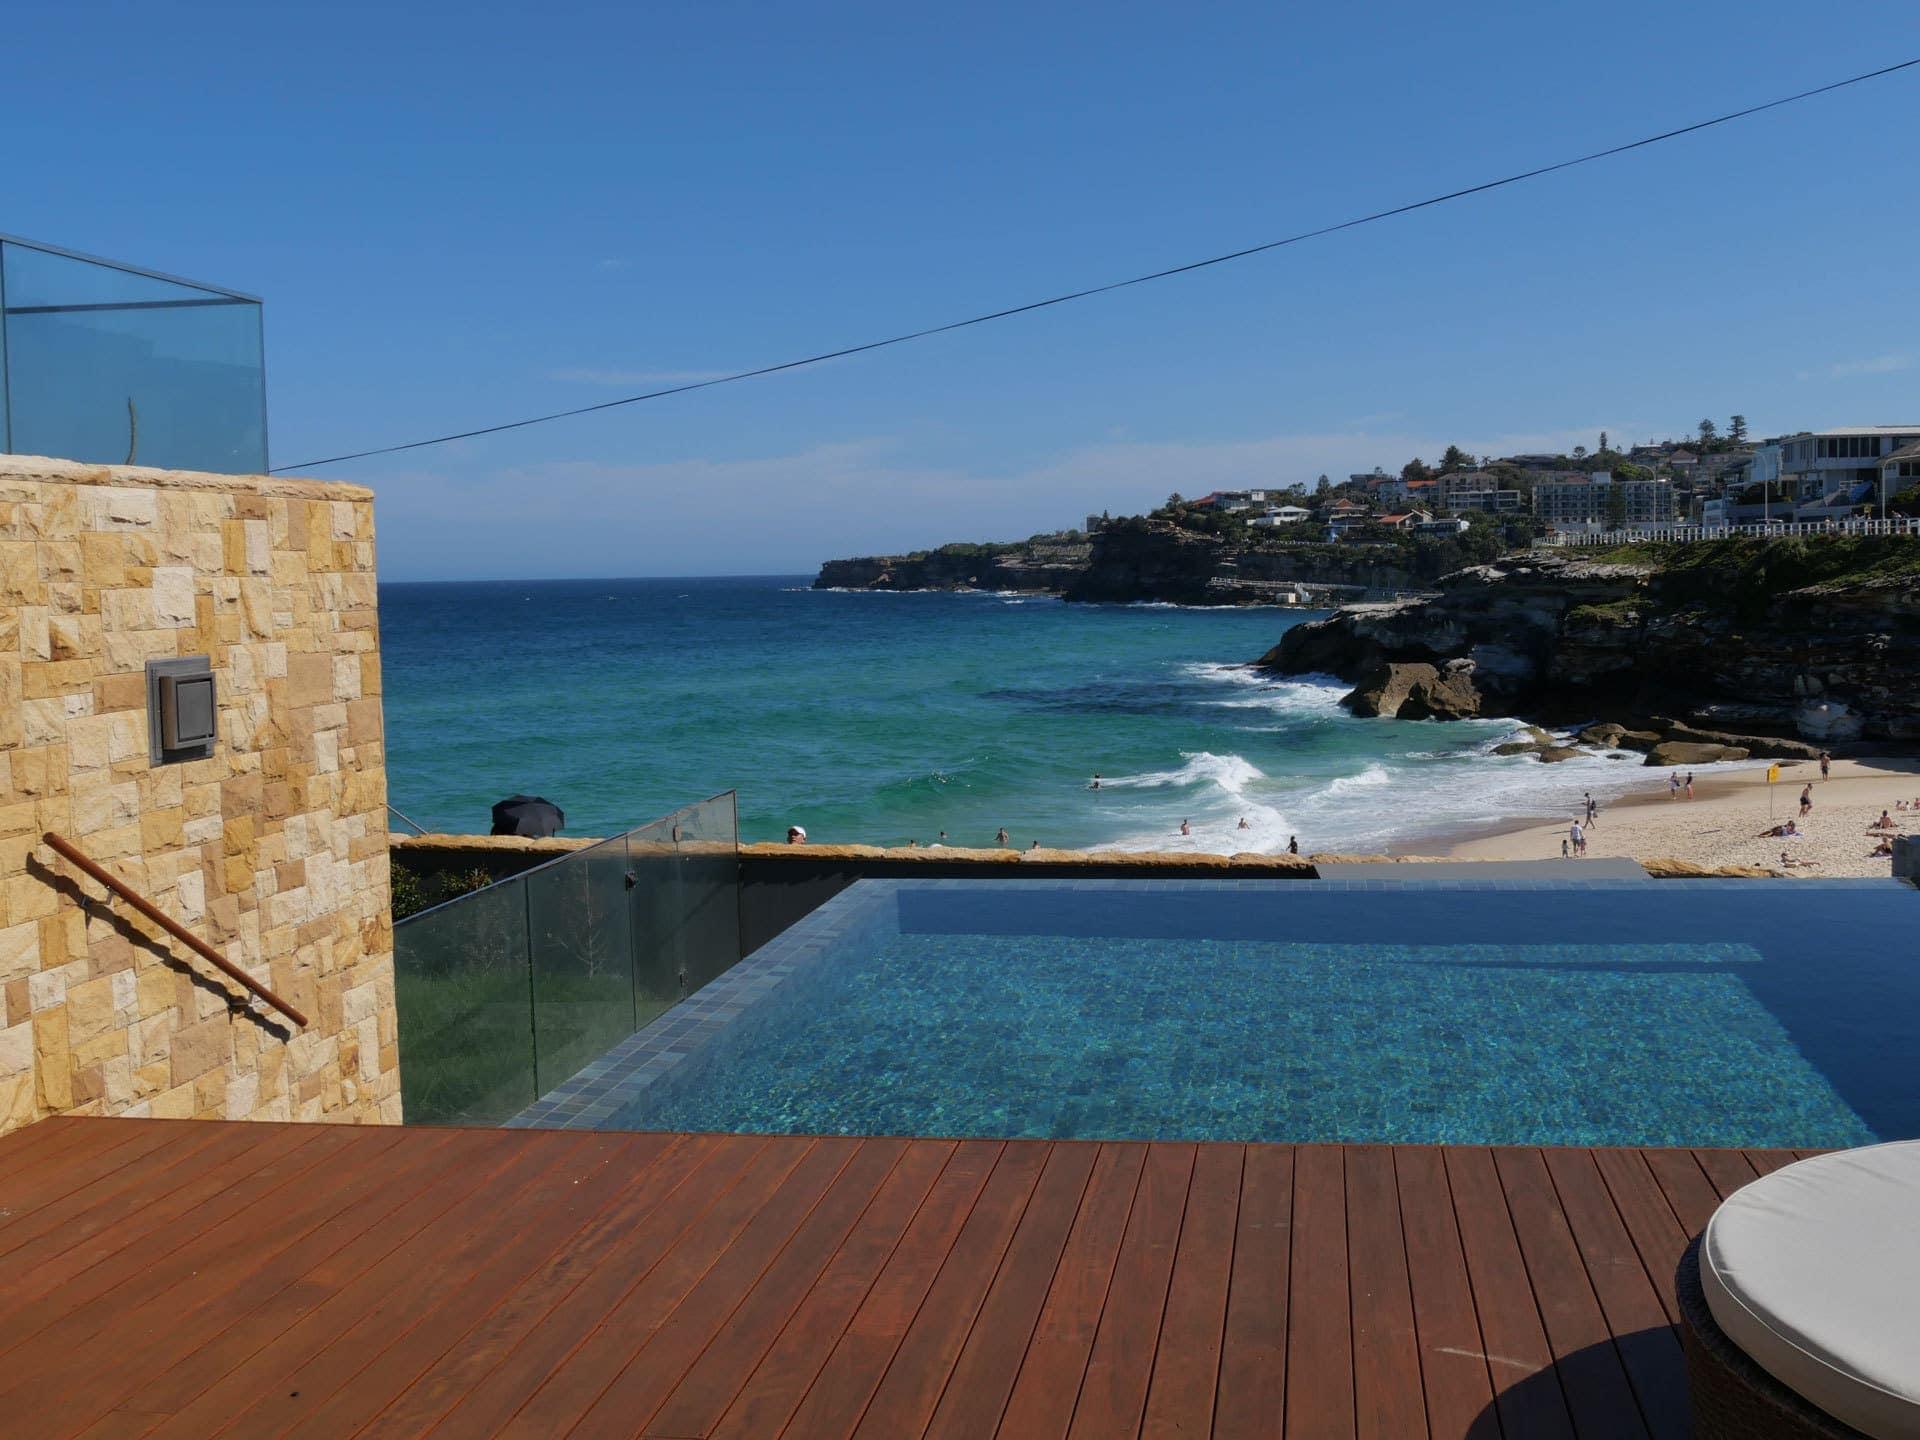 Coogee to Bondi walk : la balade préférée des Sydneysiders 24